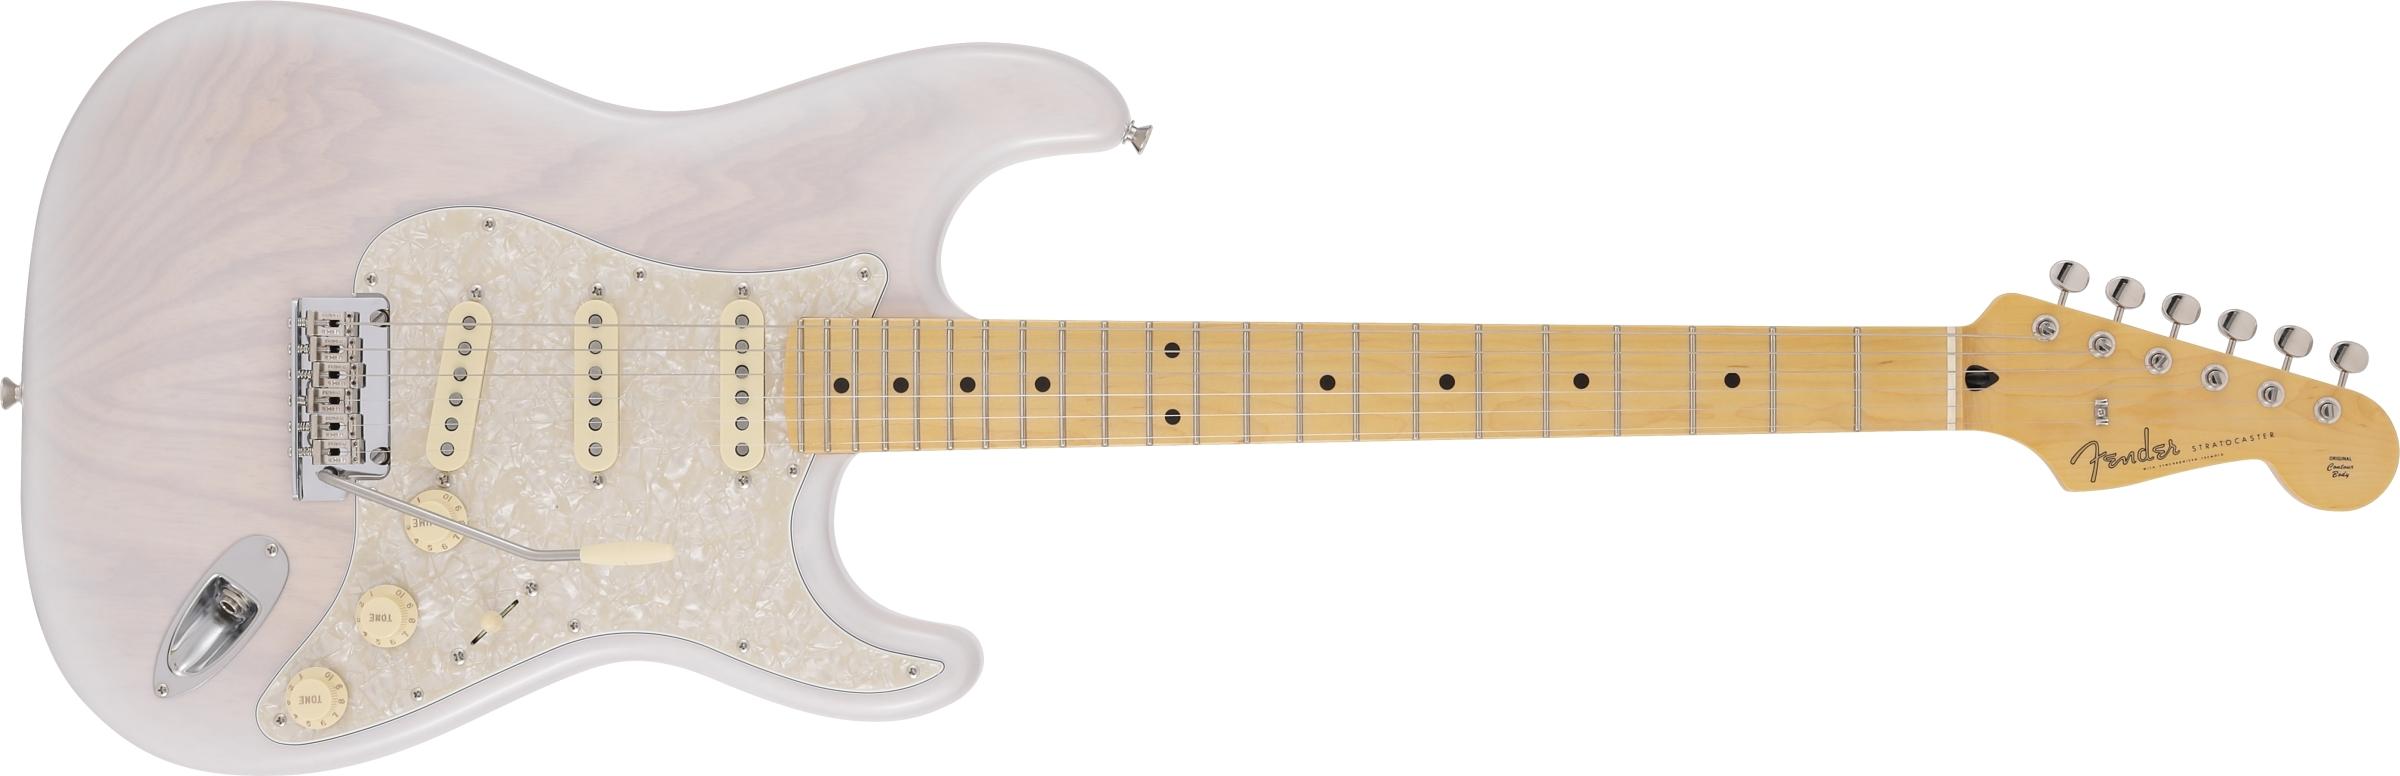 A Japan-only Fender Stratocaster